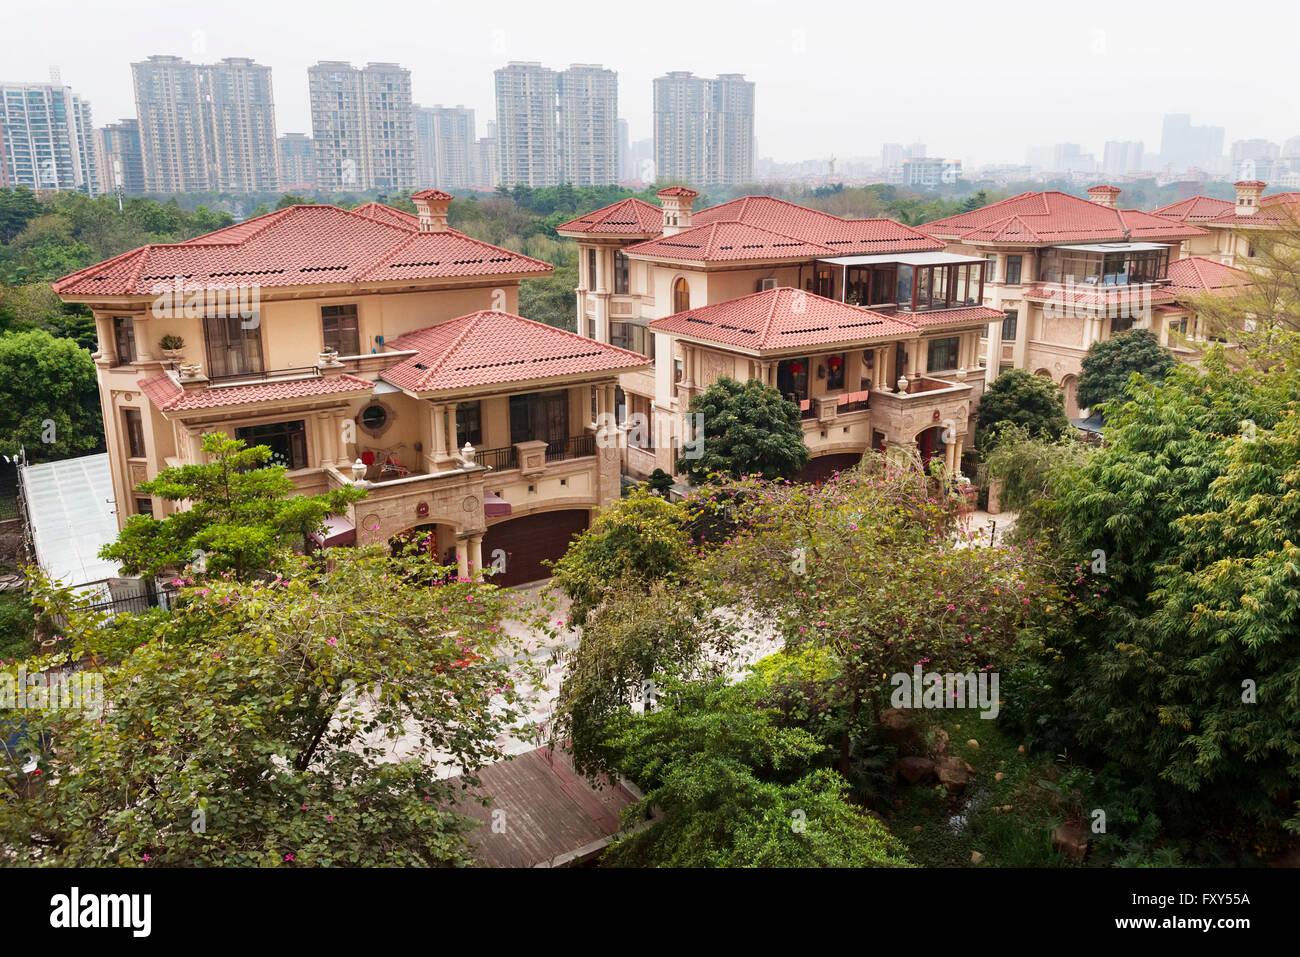 Houses In A Luxury Residential Area In Hu Jing Lu